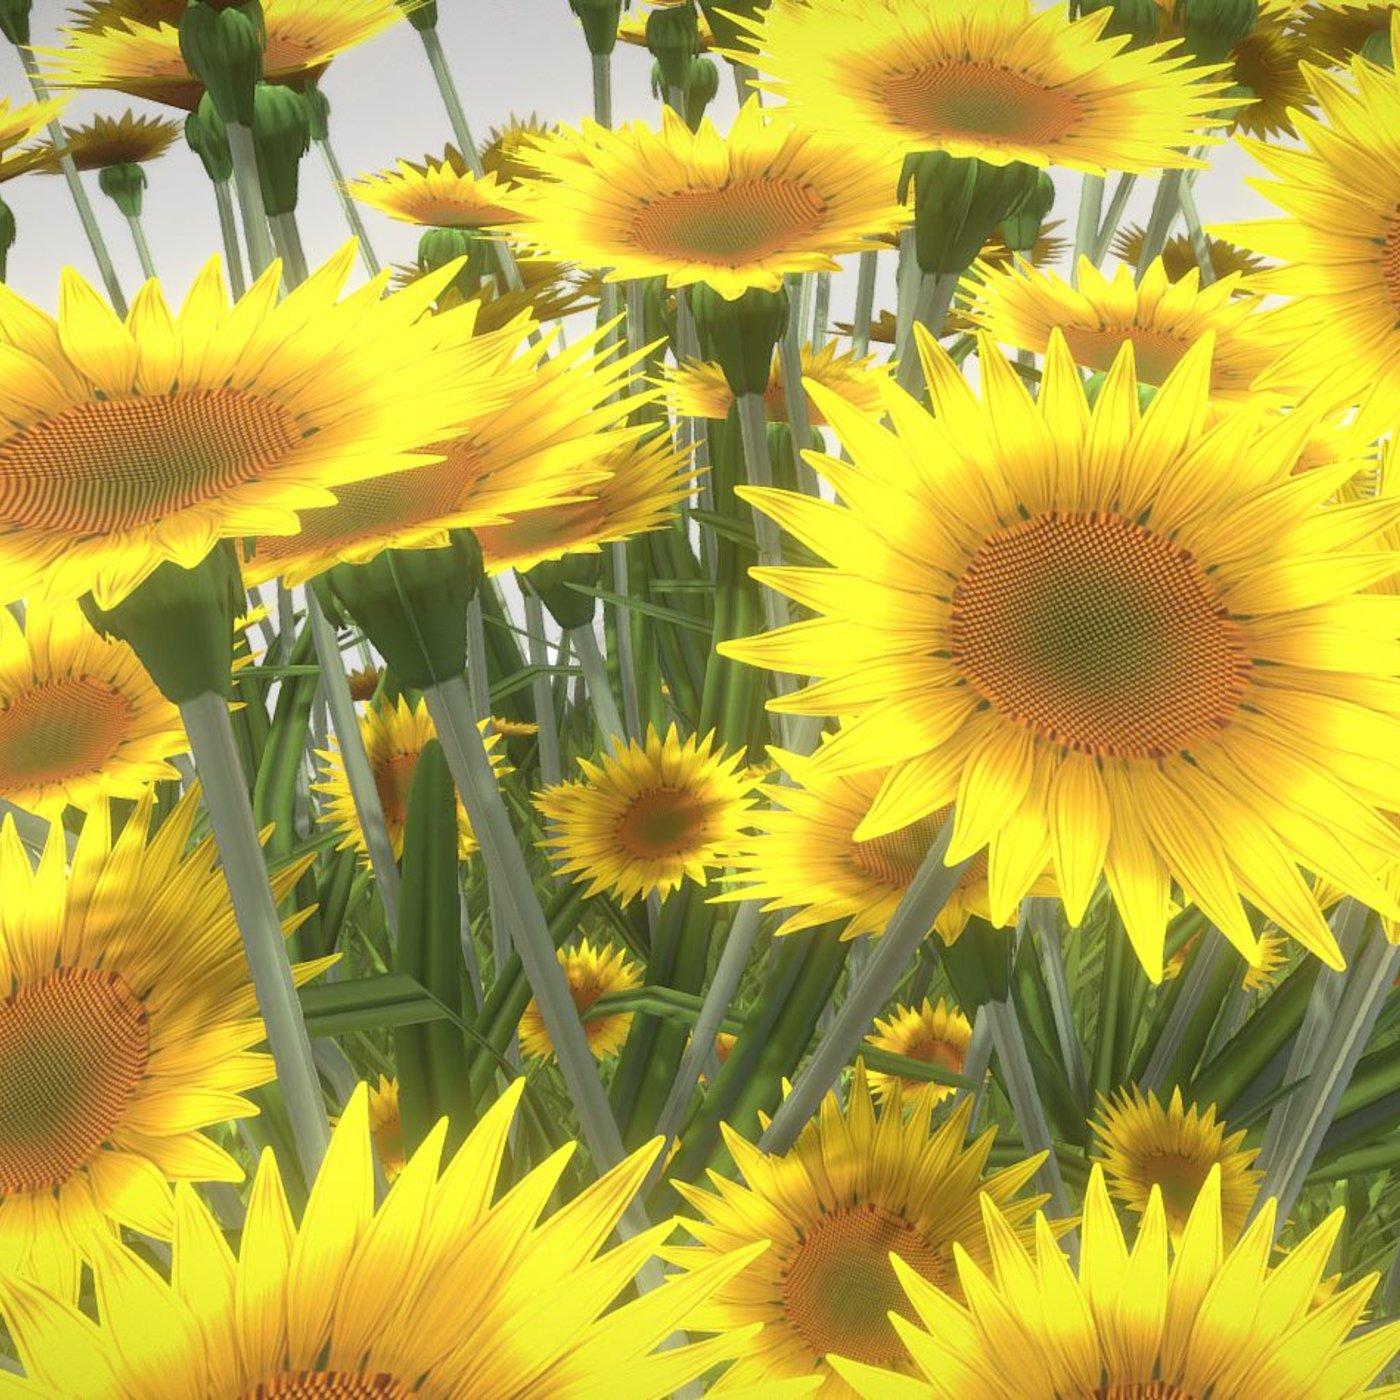 Public Plant Pot Wood-Version with Sunflowers